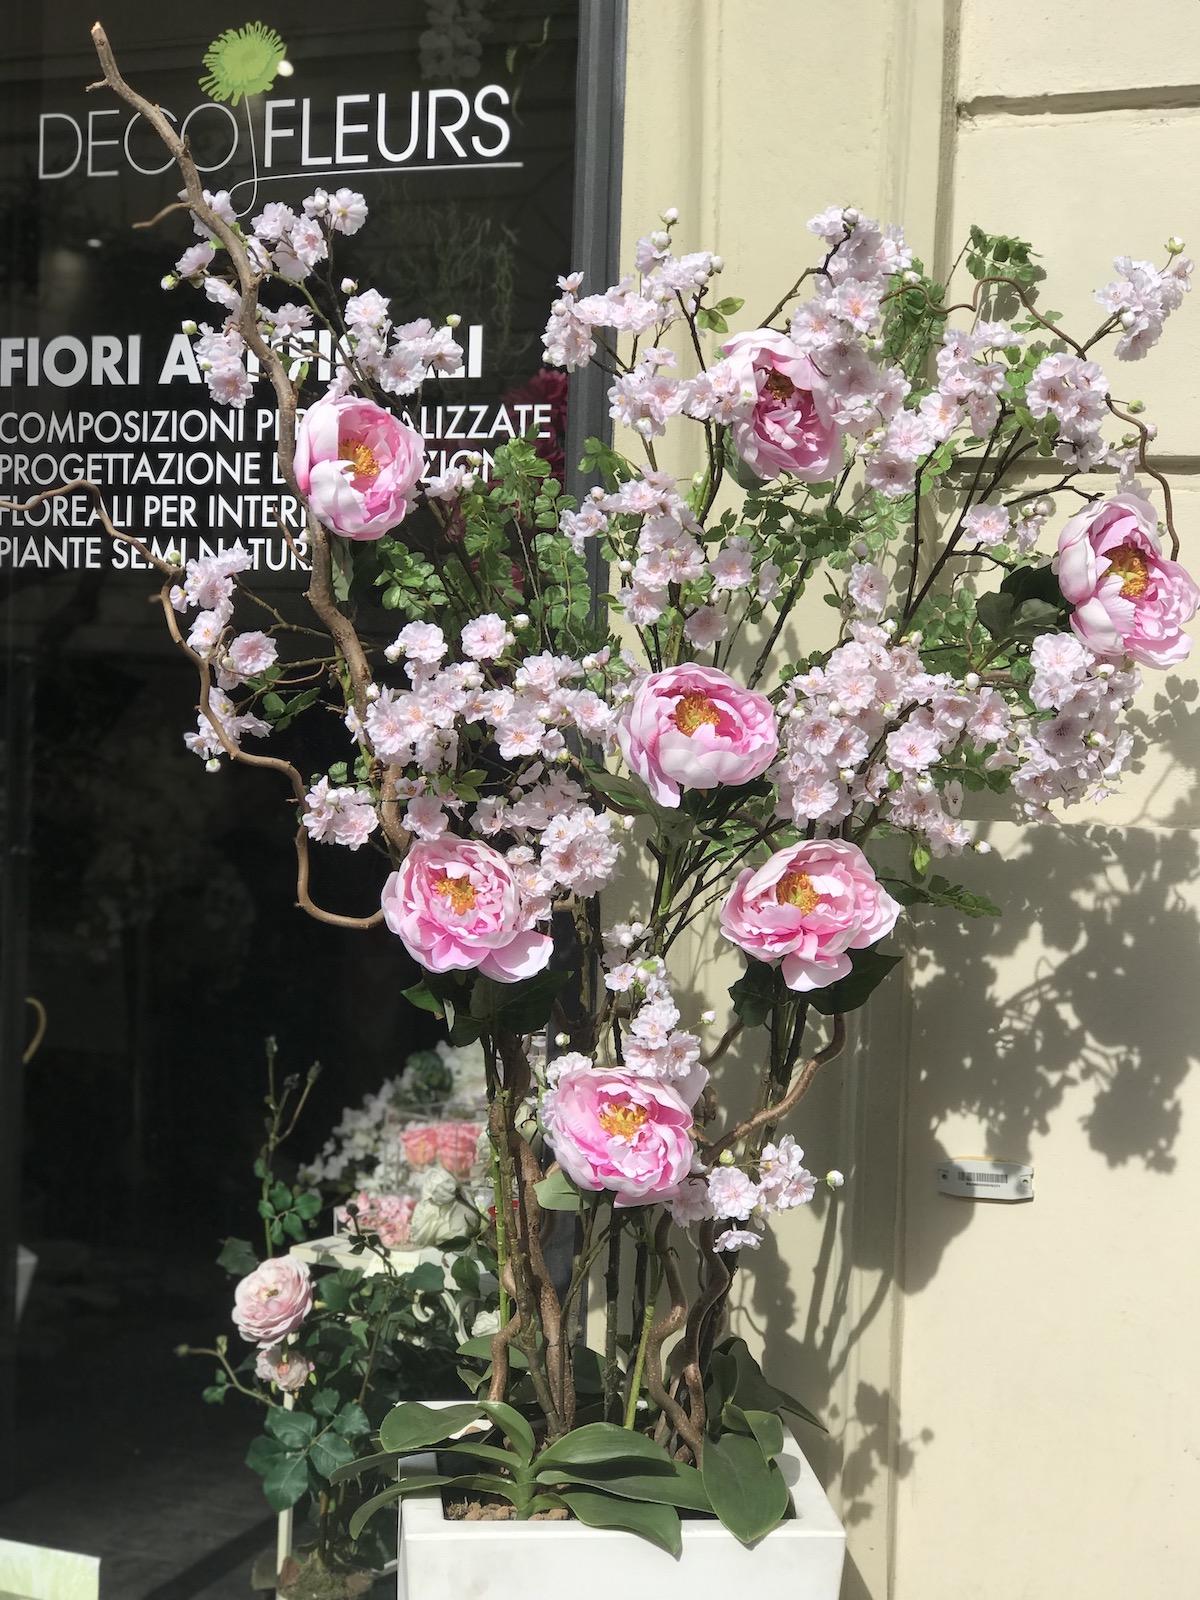 fiori di pesco peonie artificiali fiori finti deco fleurs roma prati